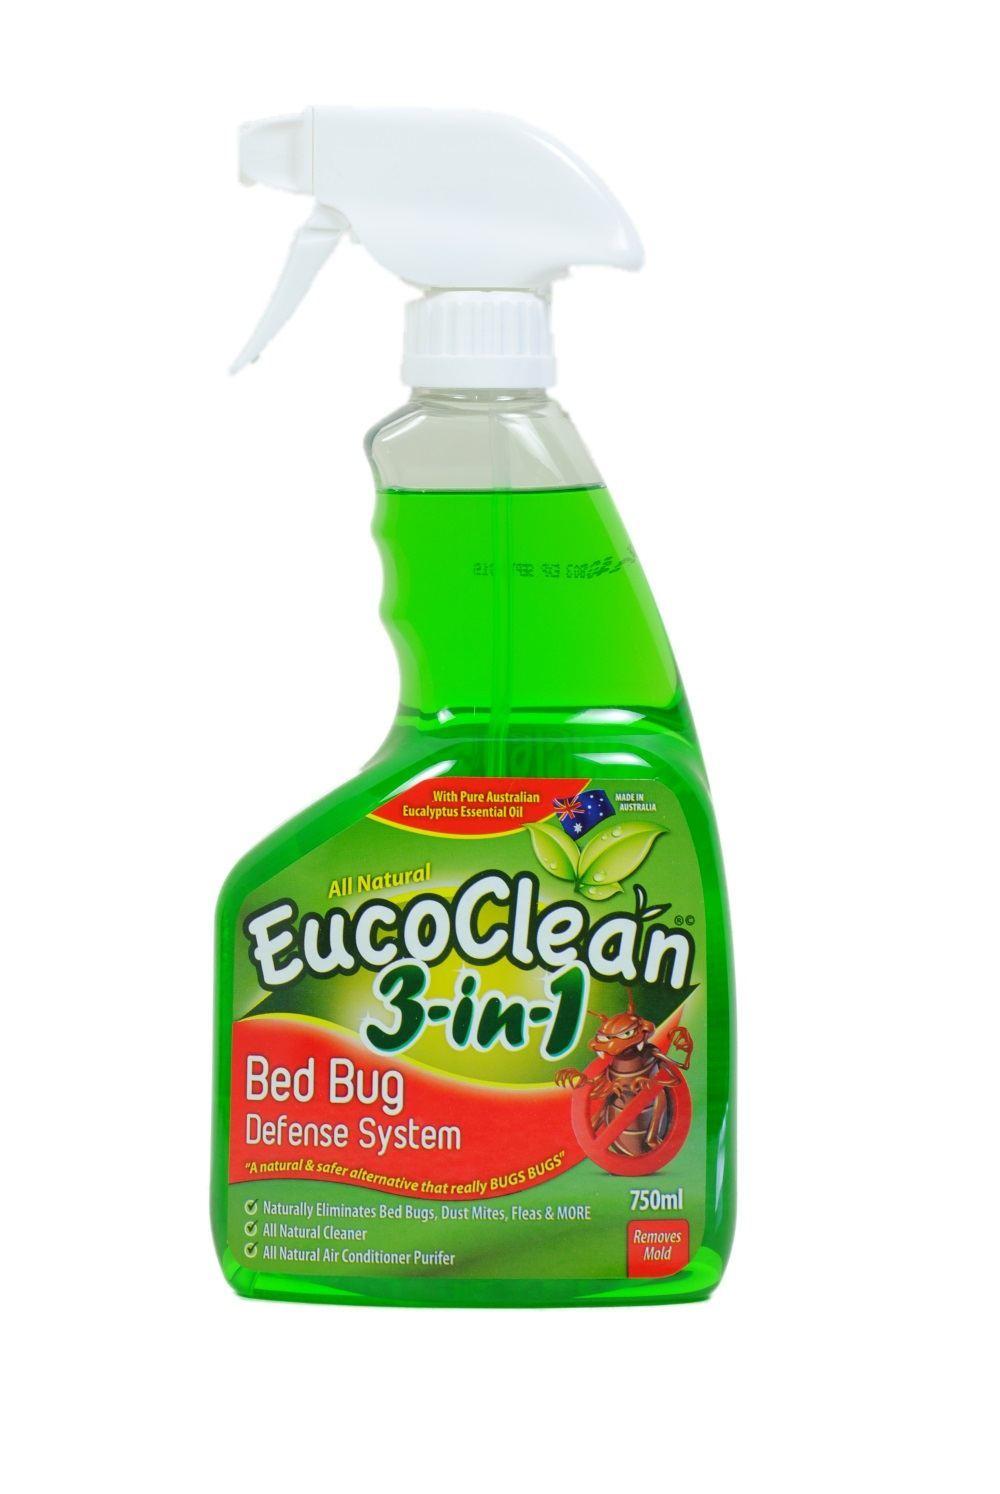 All Natural Eucoclean Bed Bug Killer Flea Dust Mite Defense